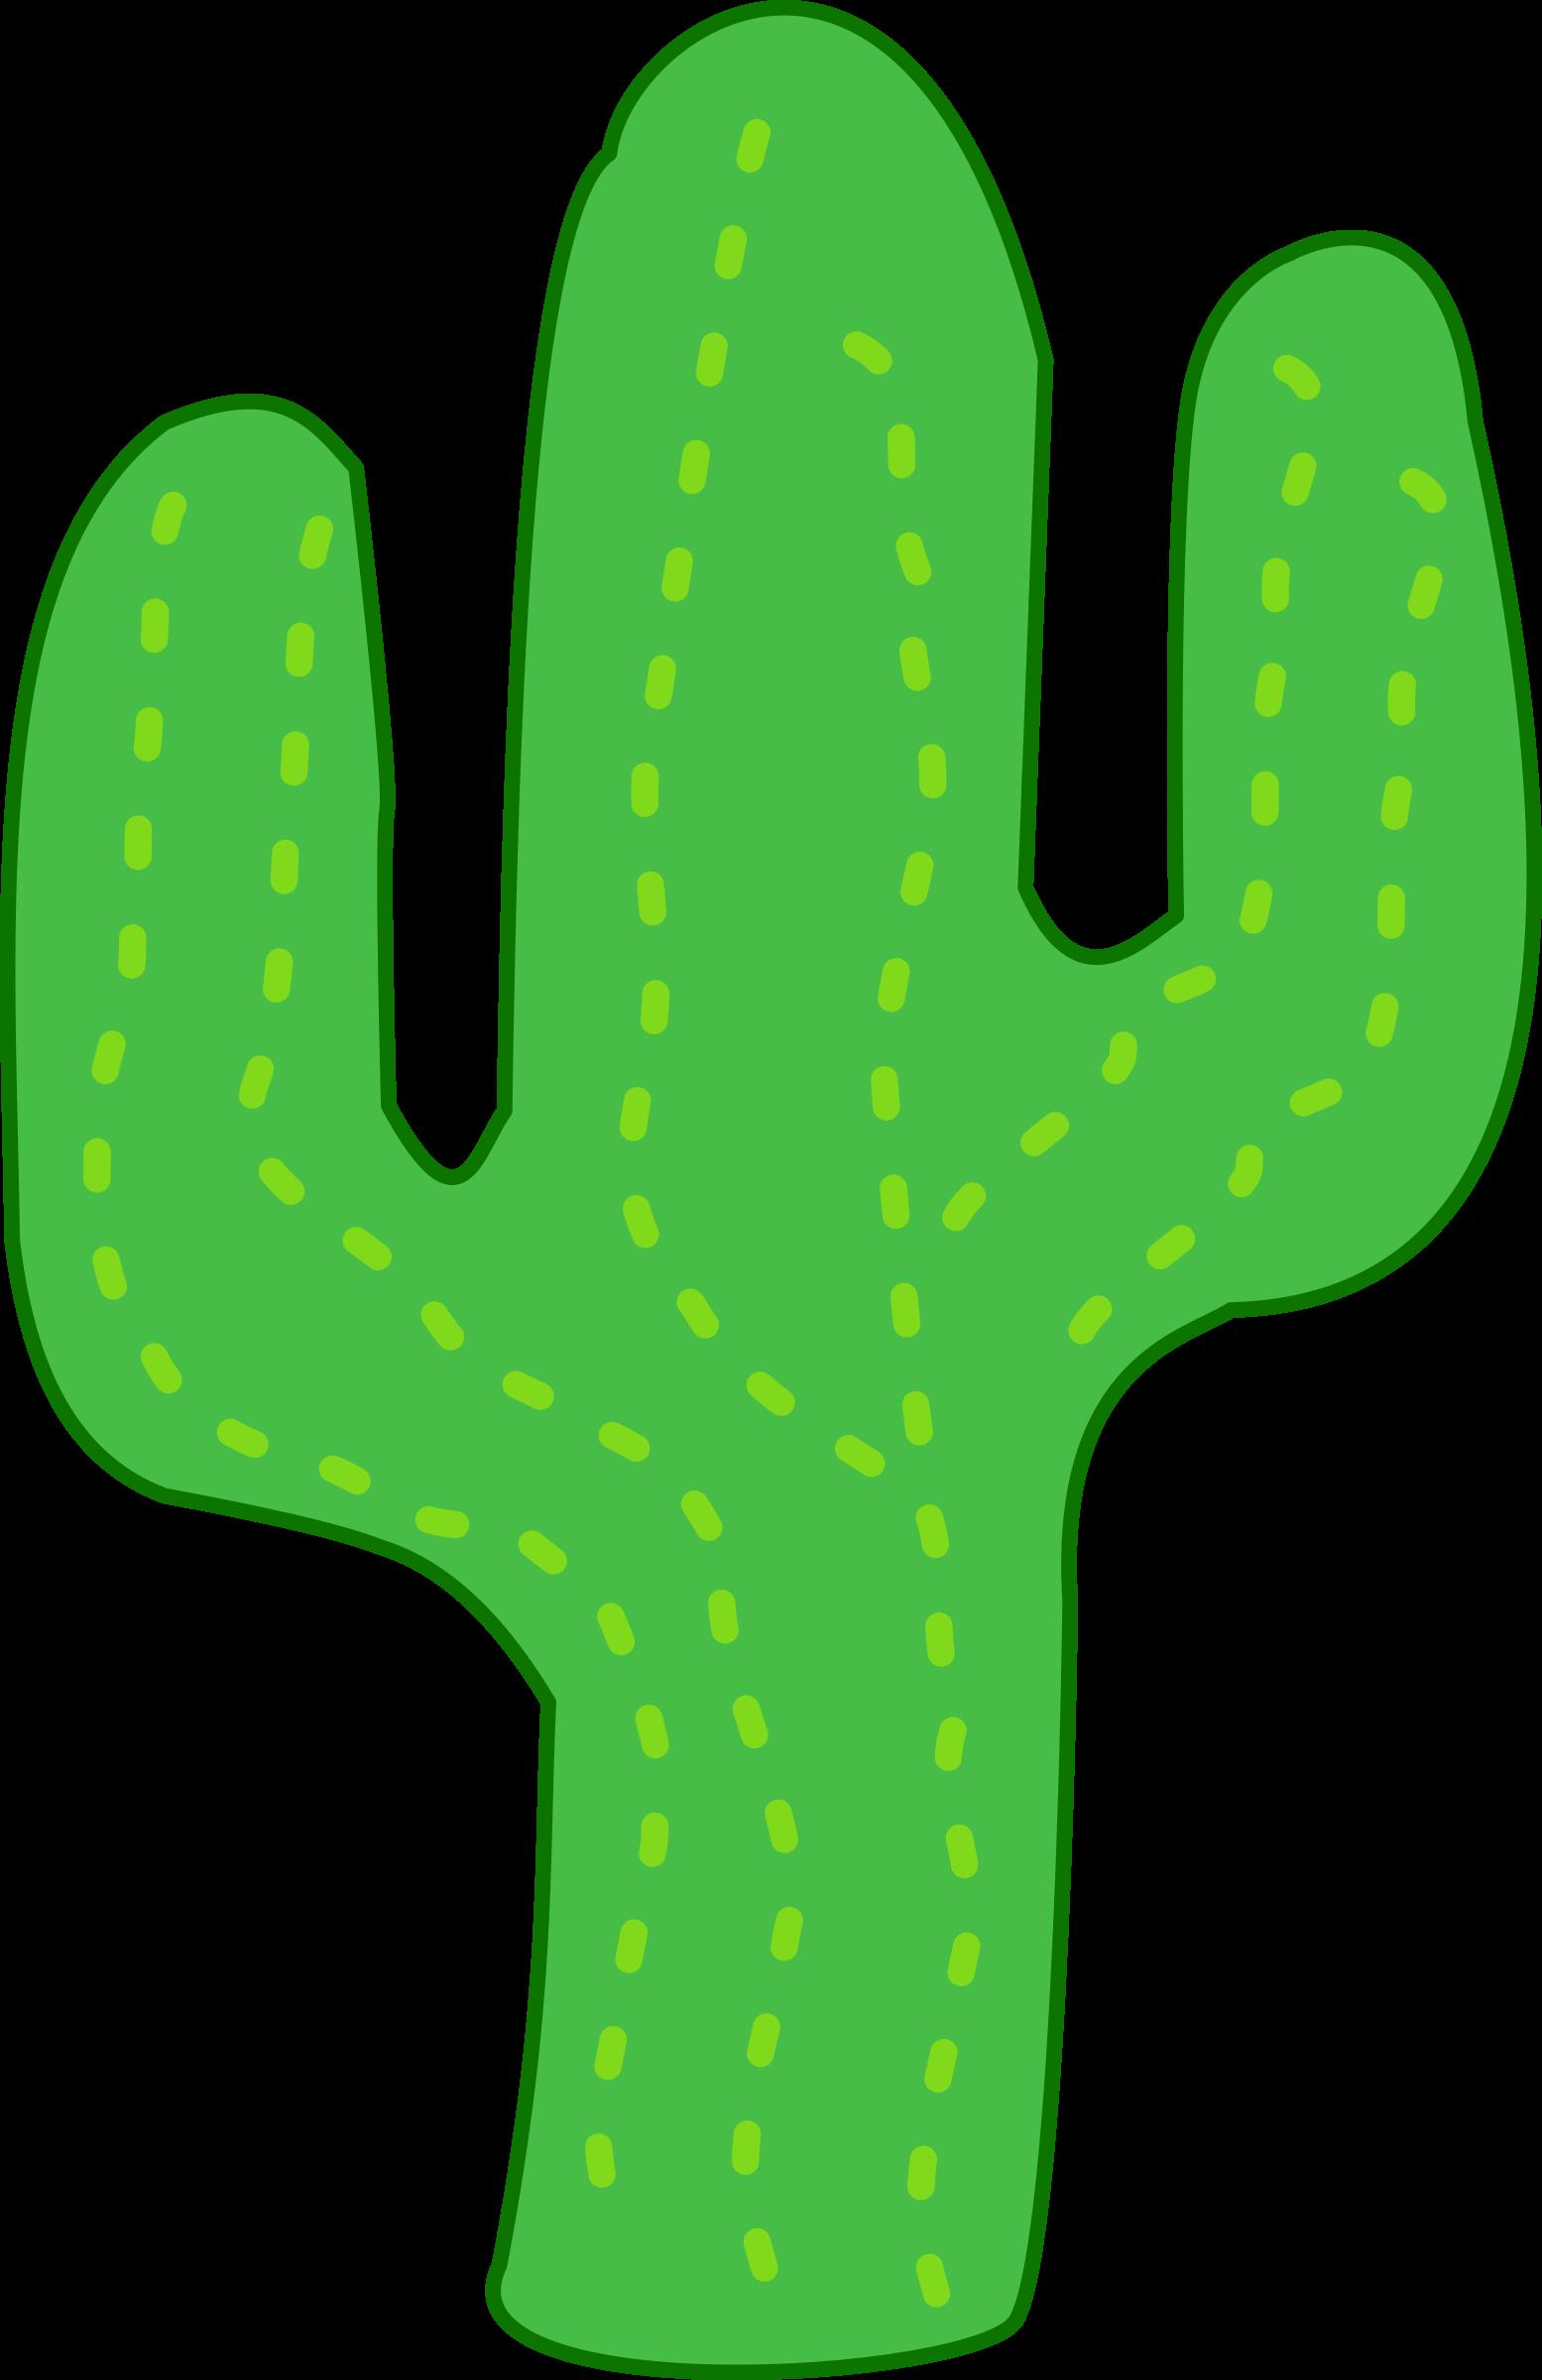 jpg library I m a hugger. Cactus clipart doodle.